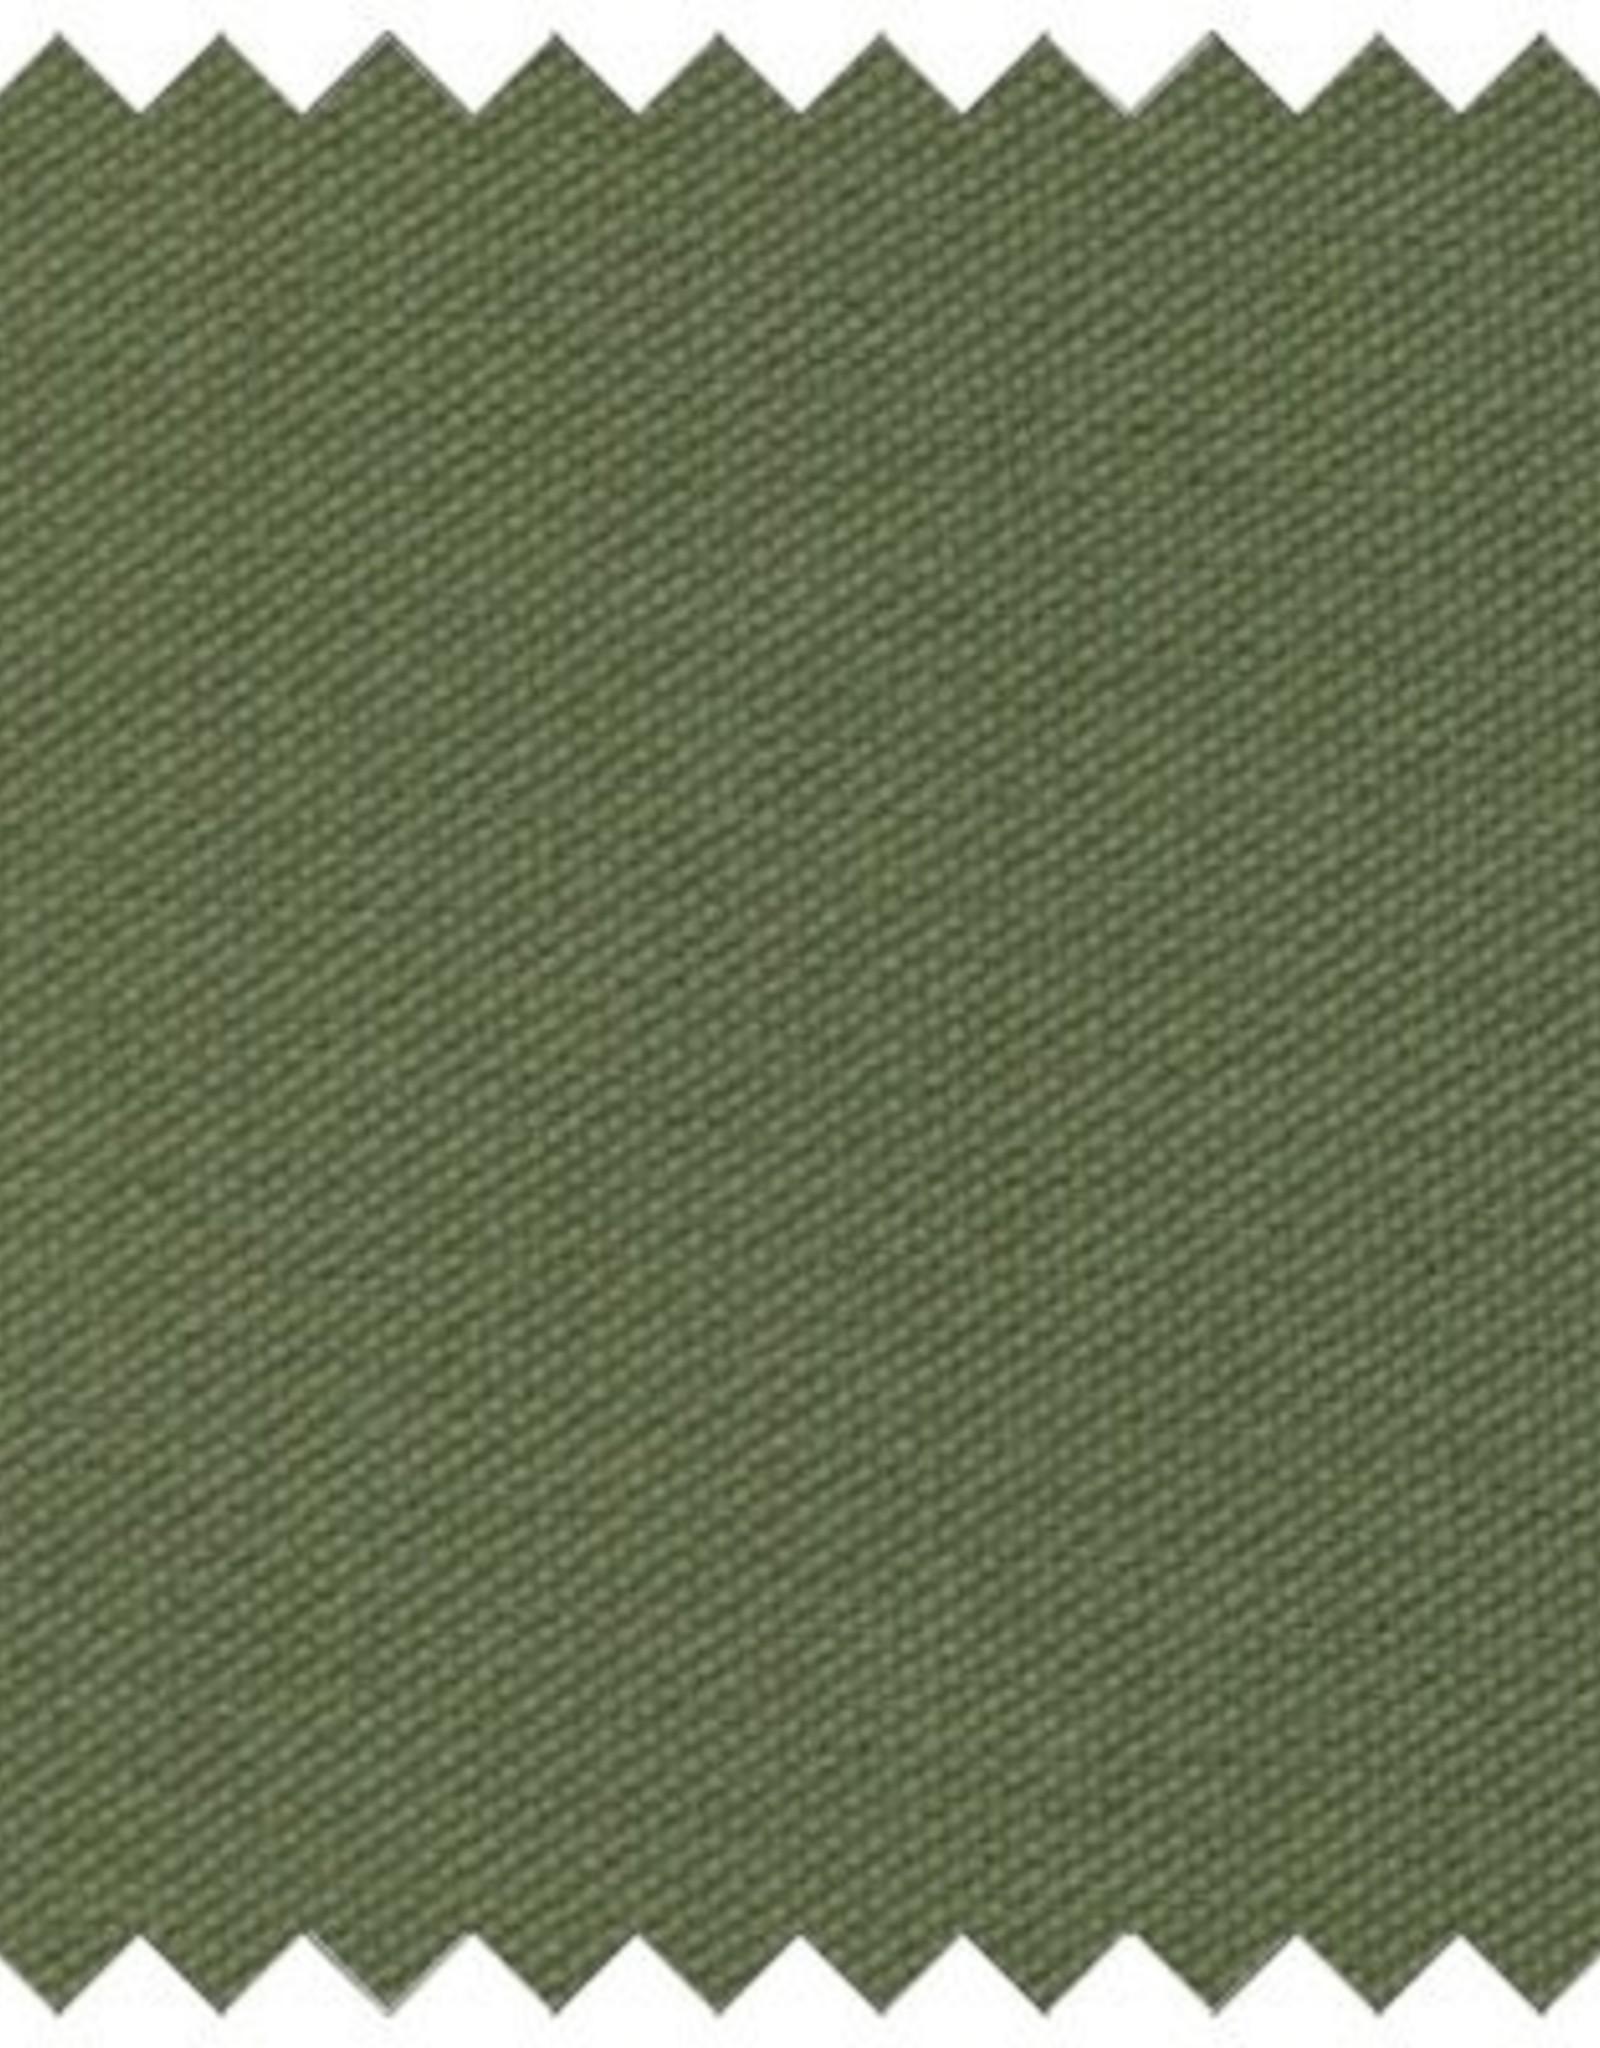 Carolina Morning Designs Kapok Support Cushion - Organic Moss